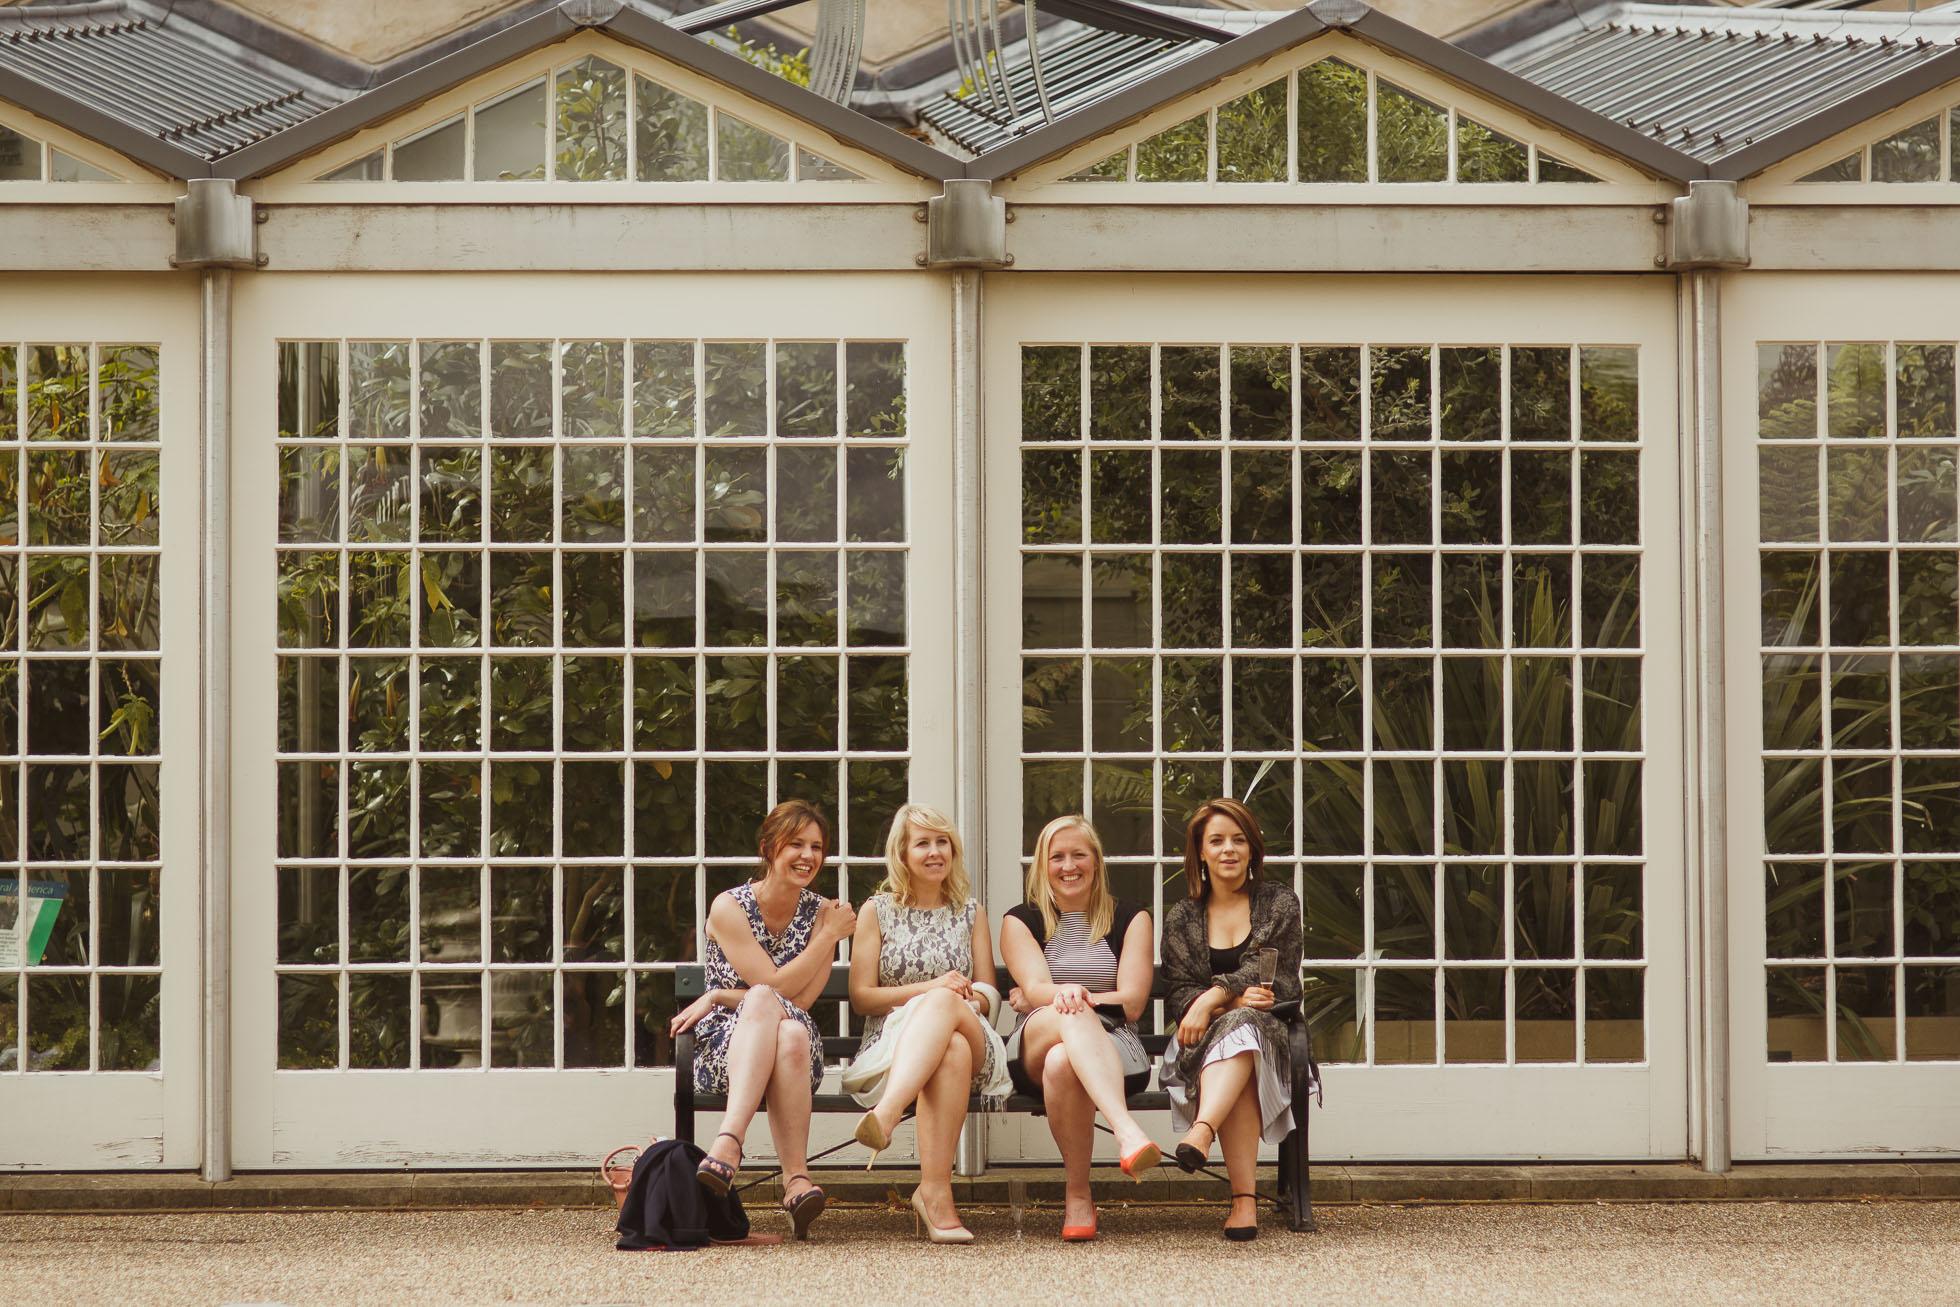 sheffield-botanical-gardens-wedding-photographer-44.jpg